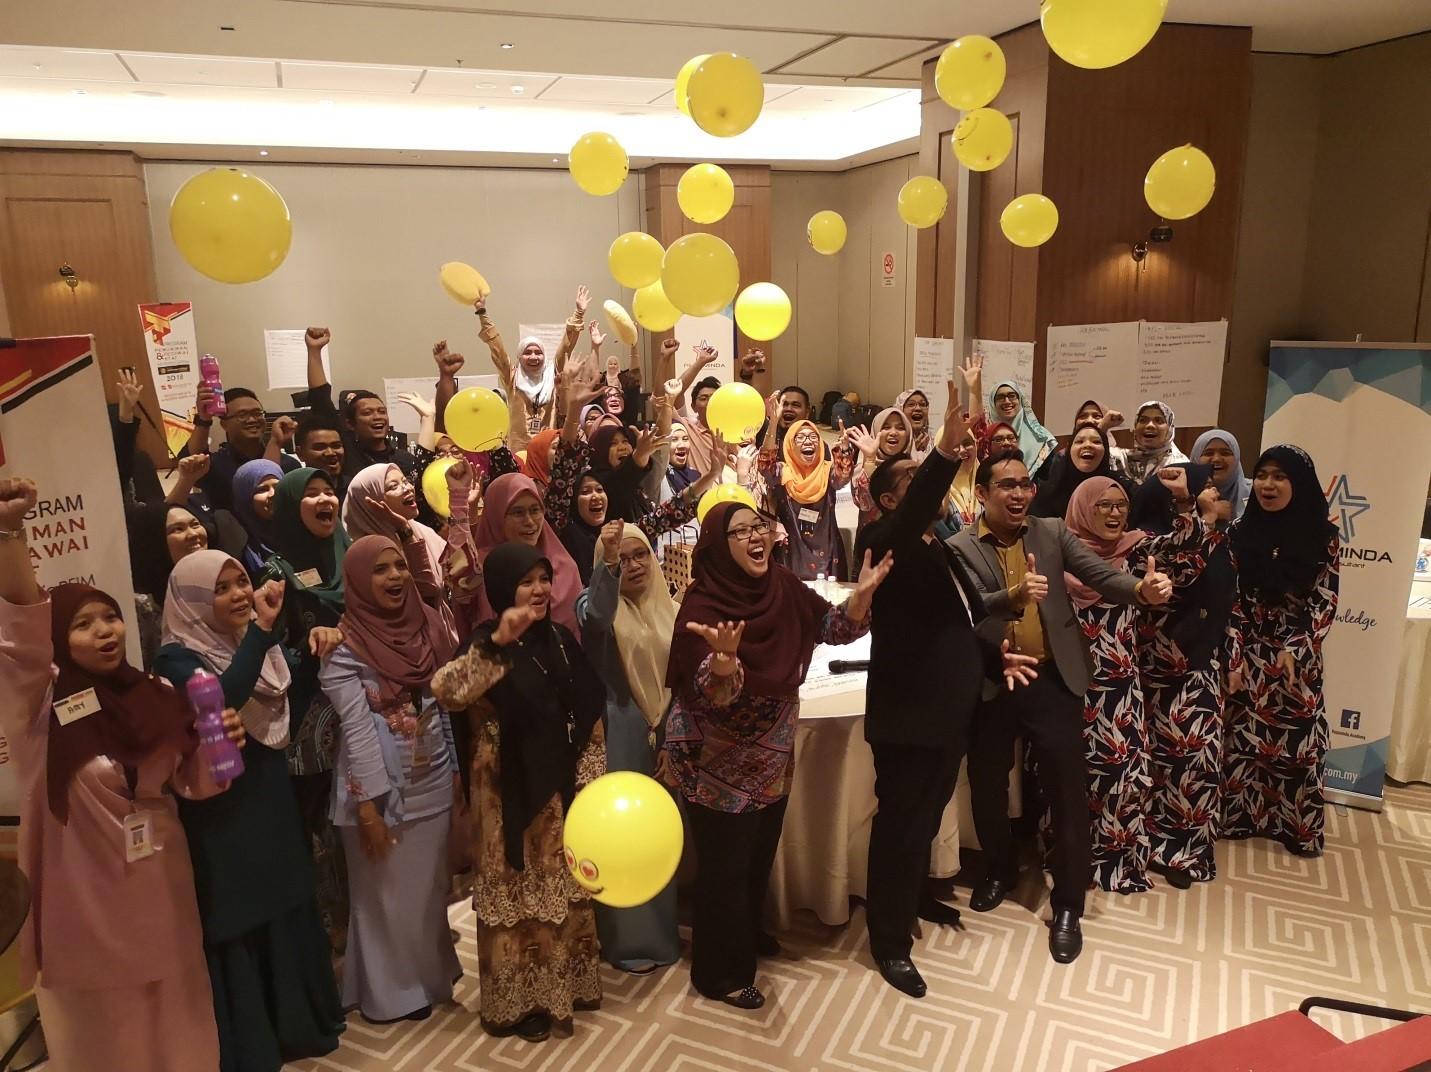 Kepentingan Kursus Dan Latihan Dalam Pembangunan Organisasi Dan Sumber Manusia Di Dalam MalaysiaKepentingan Kursus Dan Latihan Dalam Pembangunan Organisasi Dan Sumber Manusia Di Dalam Malaysia